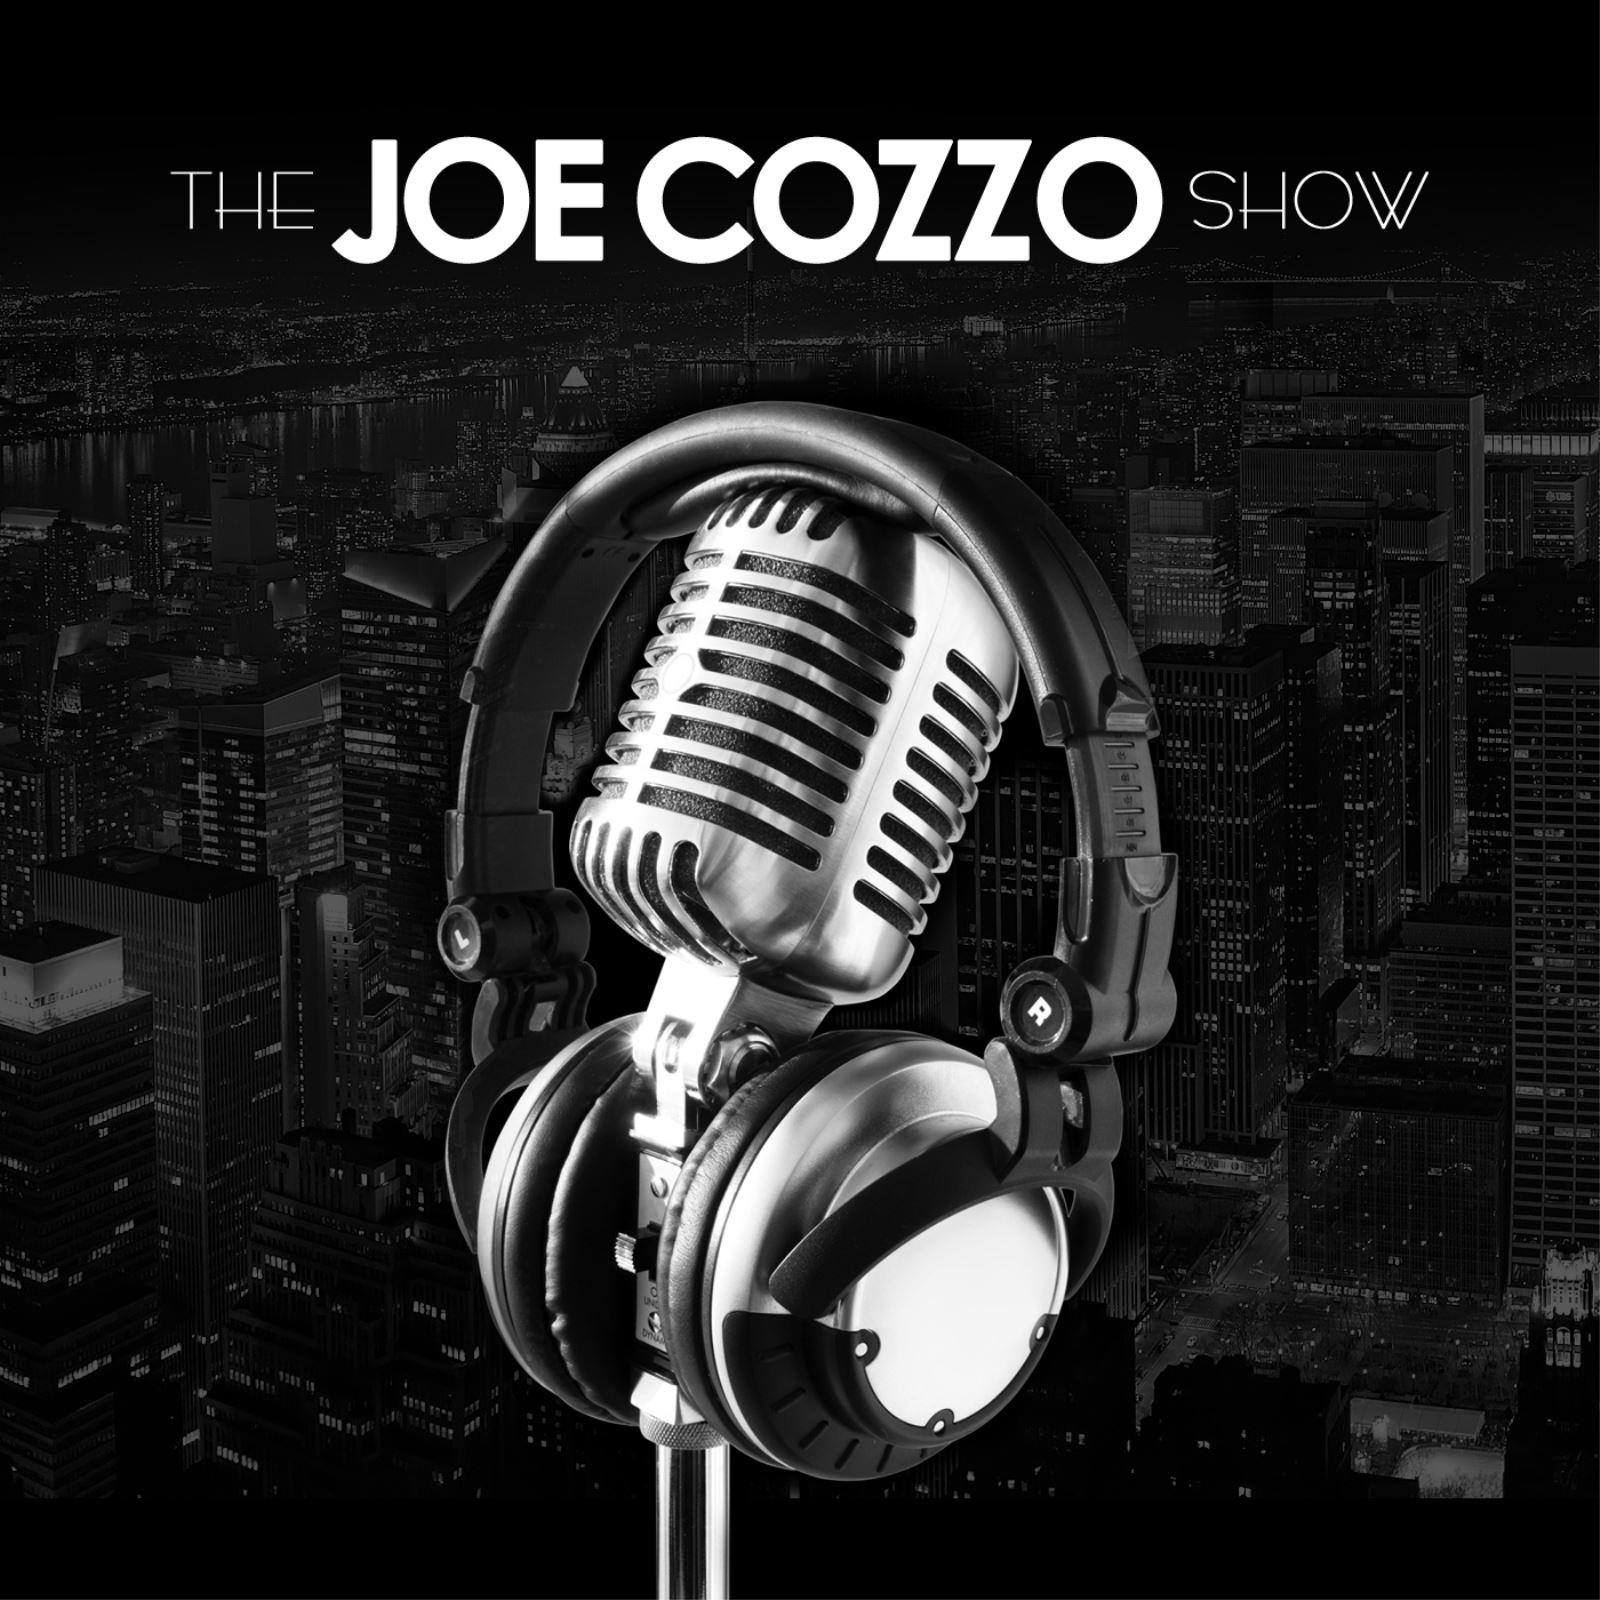 The Joe Cozzo Show